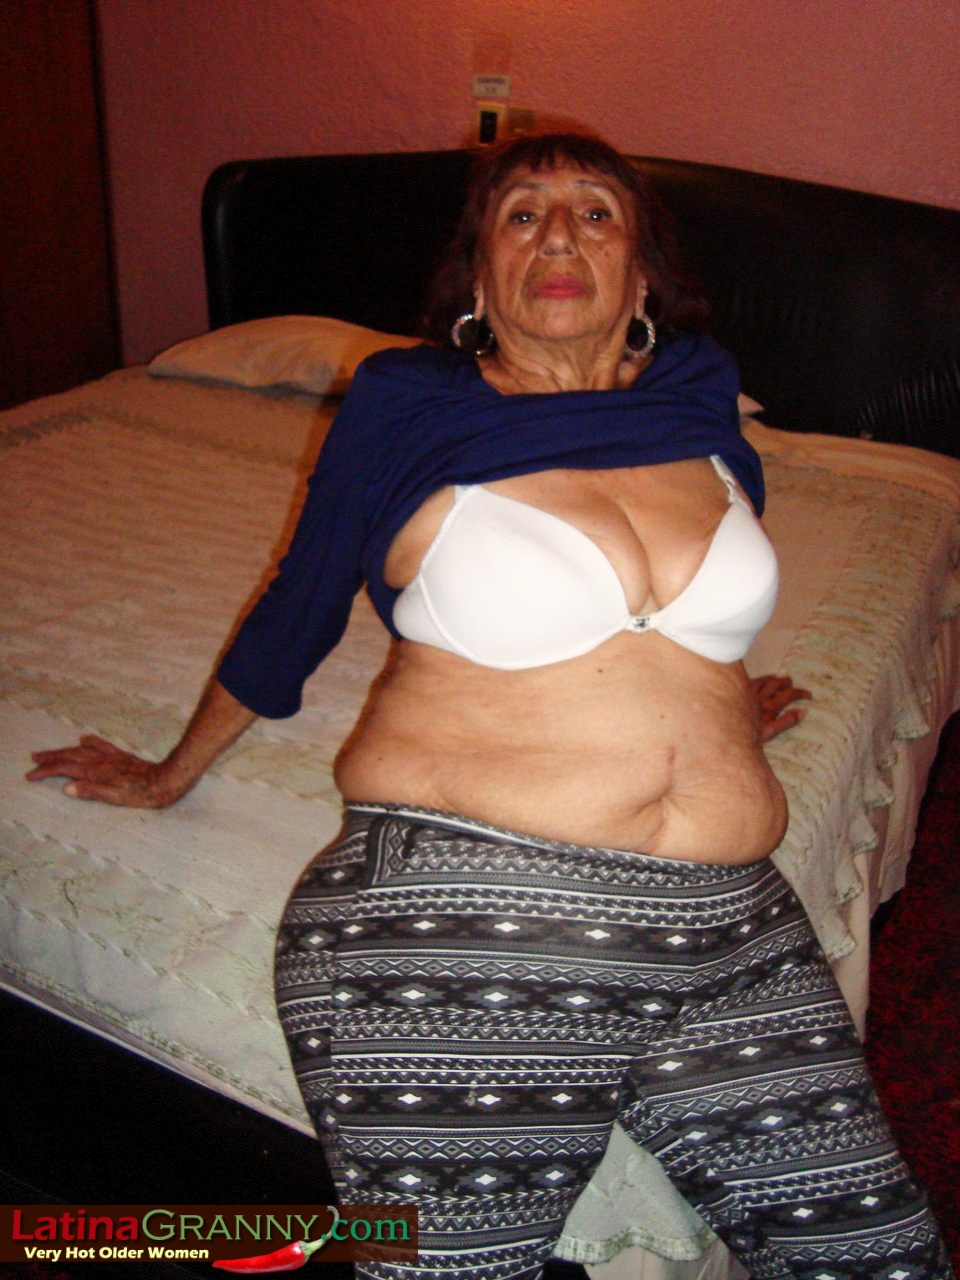 Granny Video Free